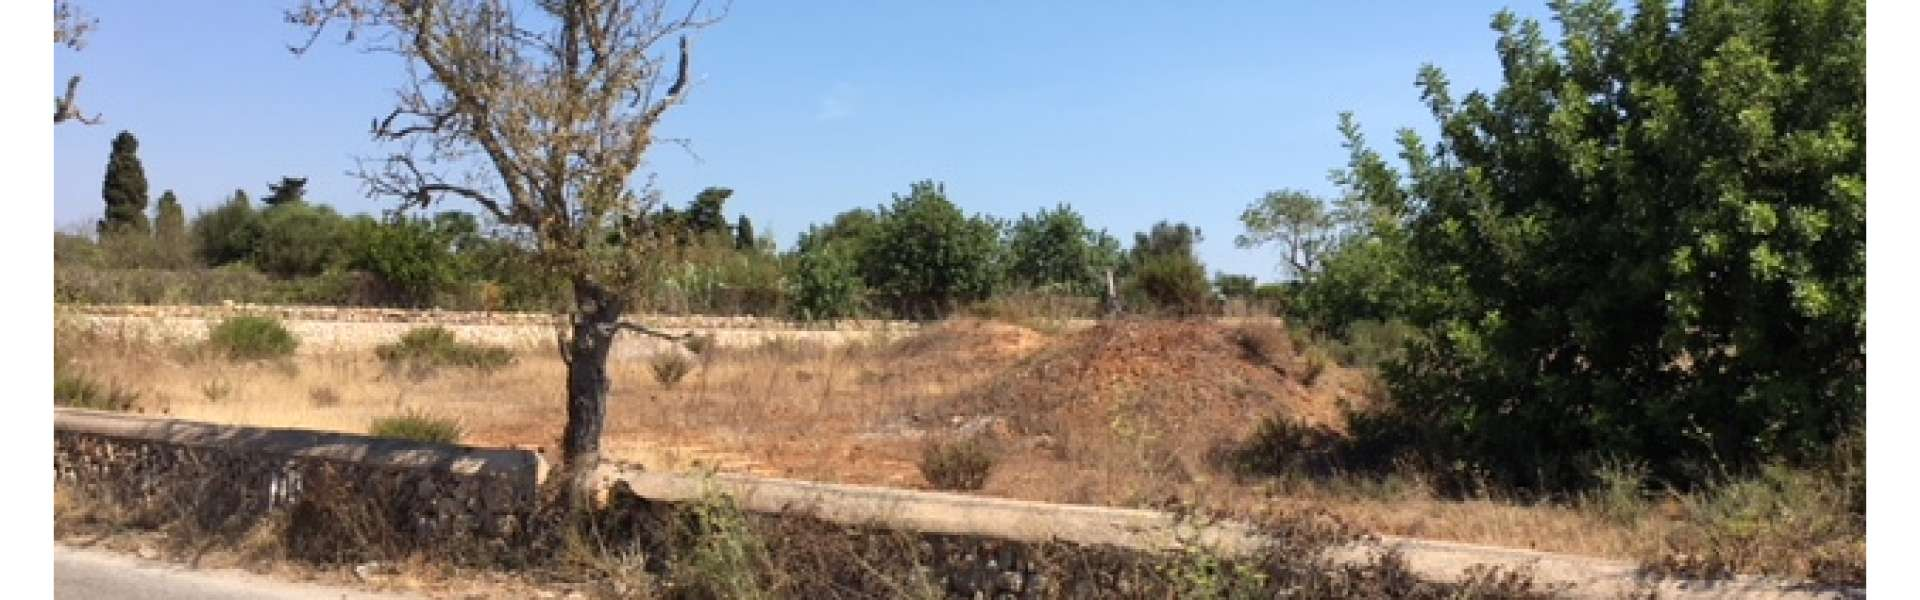 Finca-Baugrundstück in Porto Petro zum Kauf